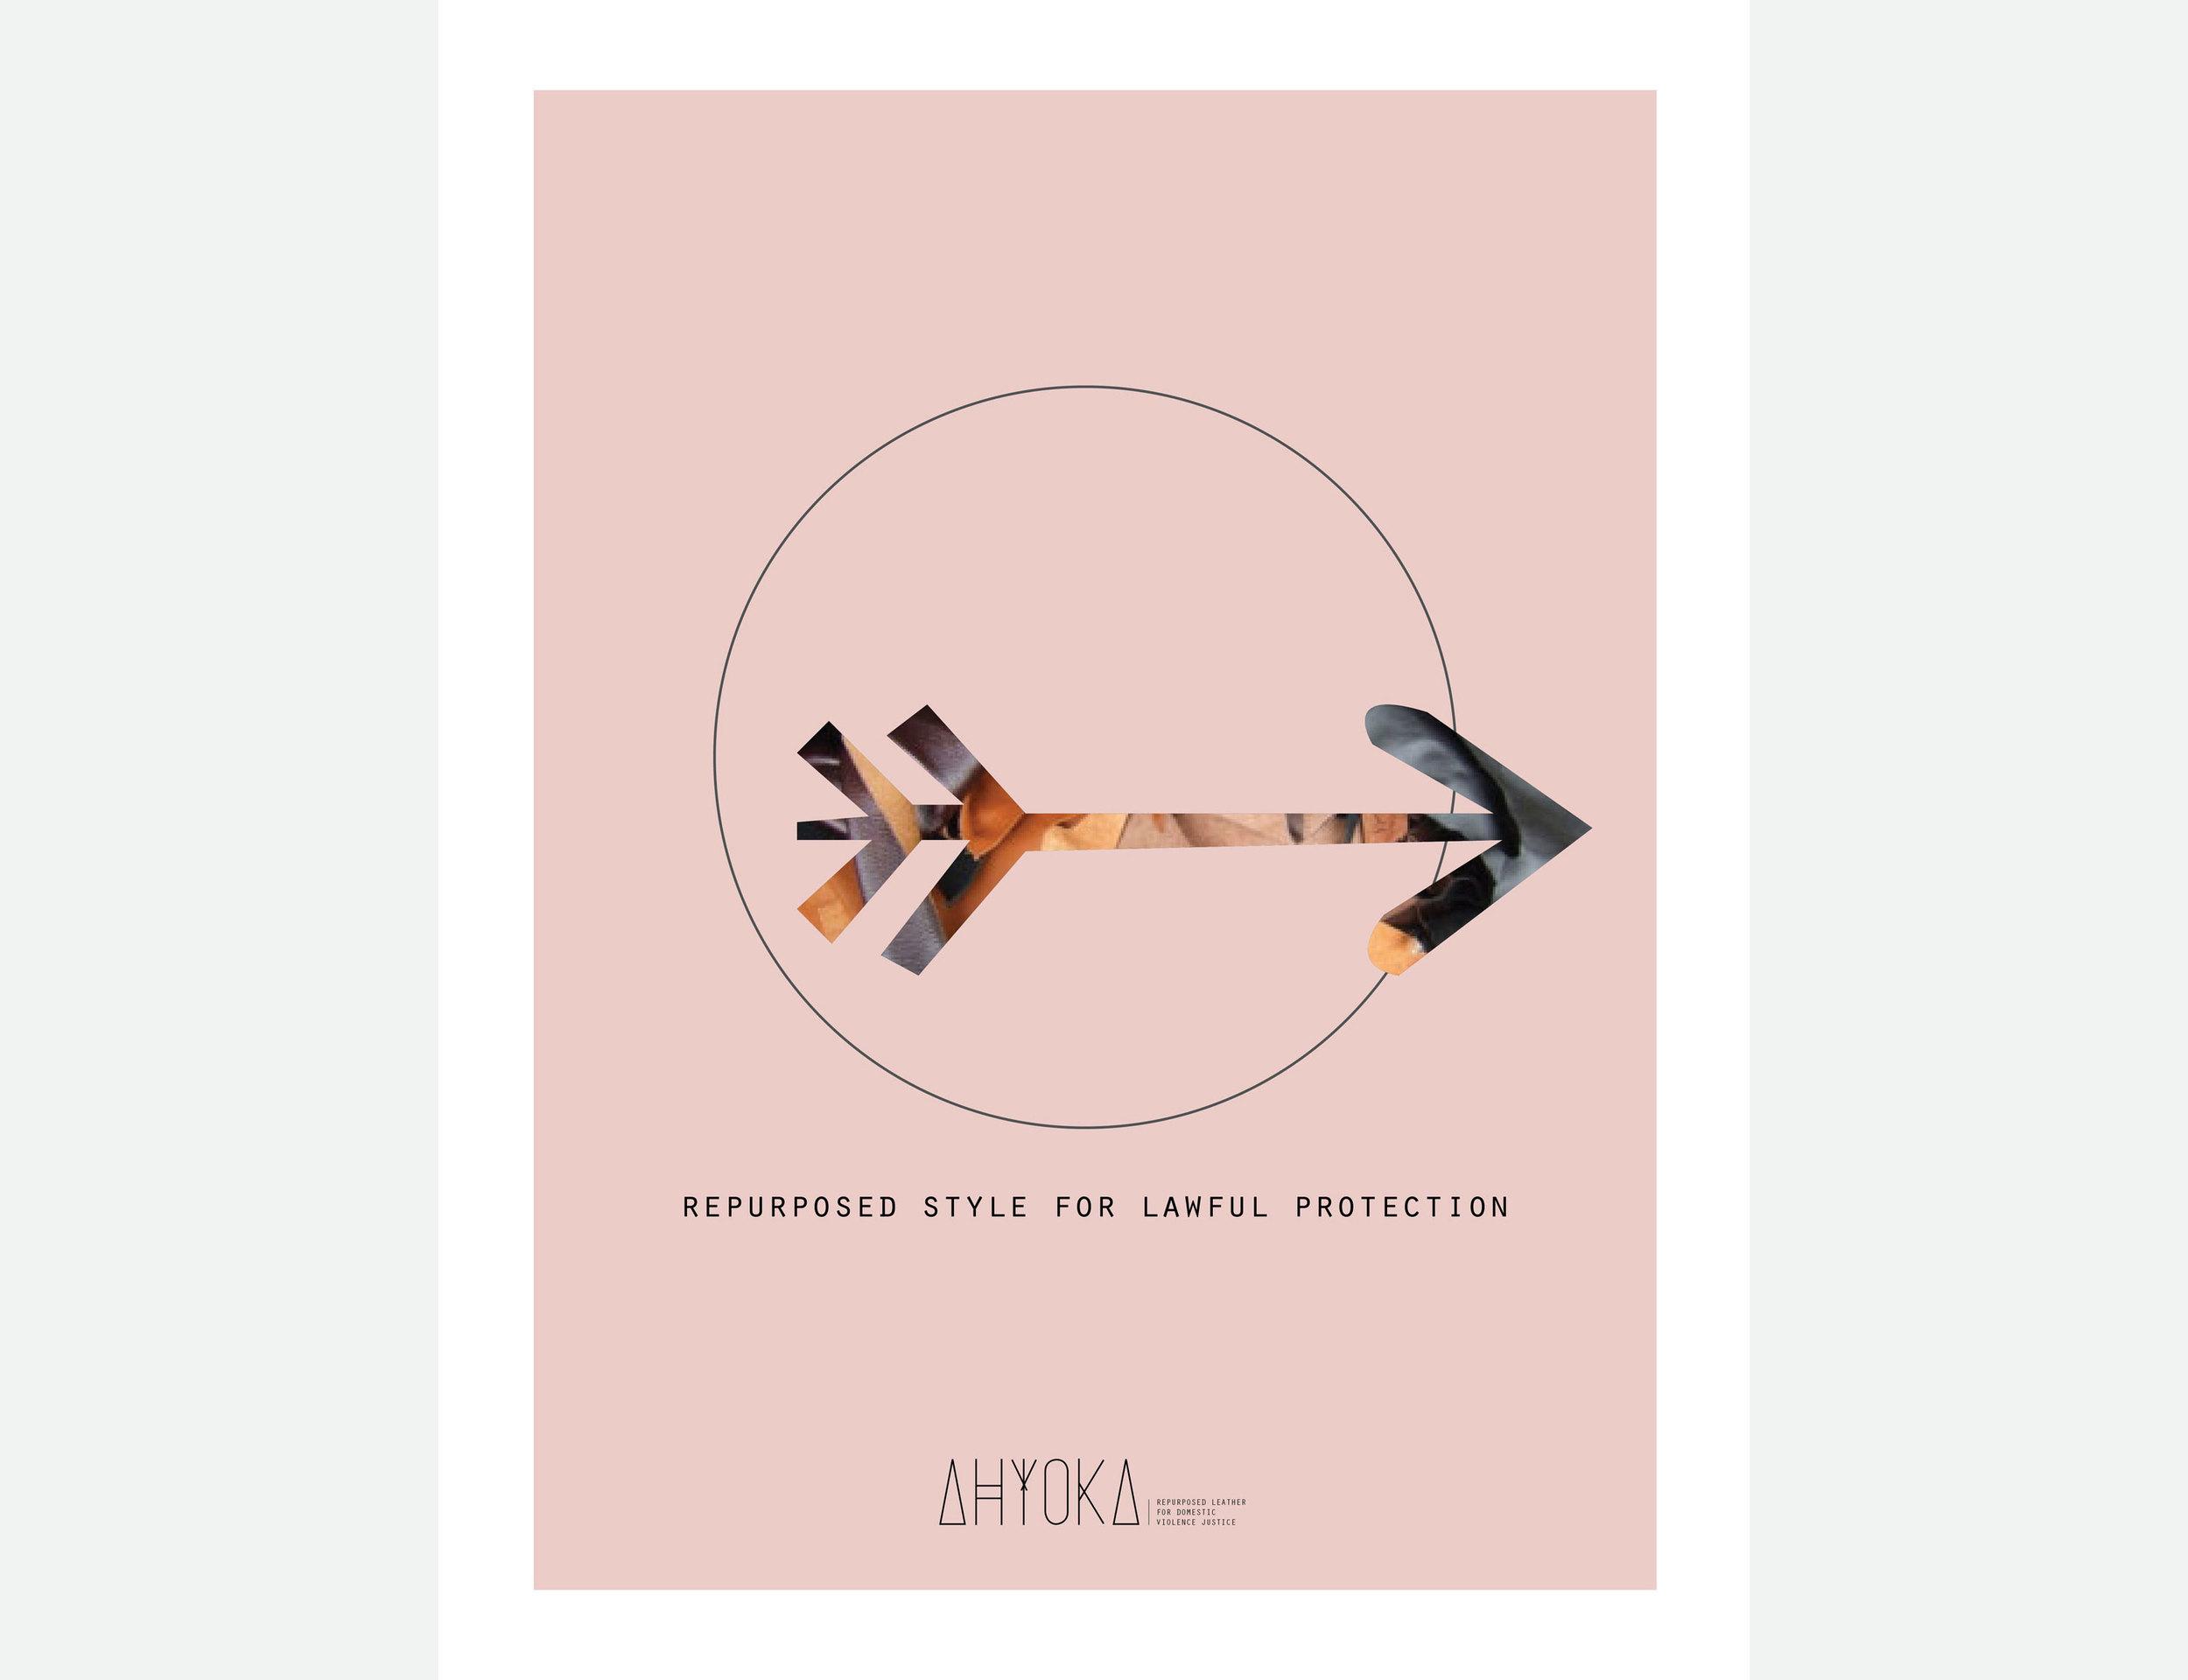 Ahyoka_Posters4.jpg